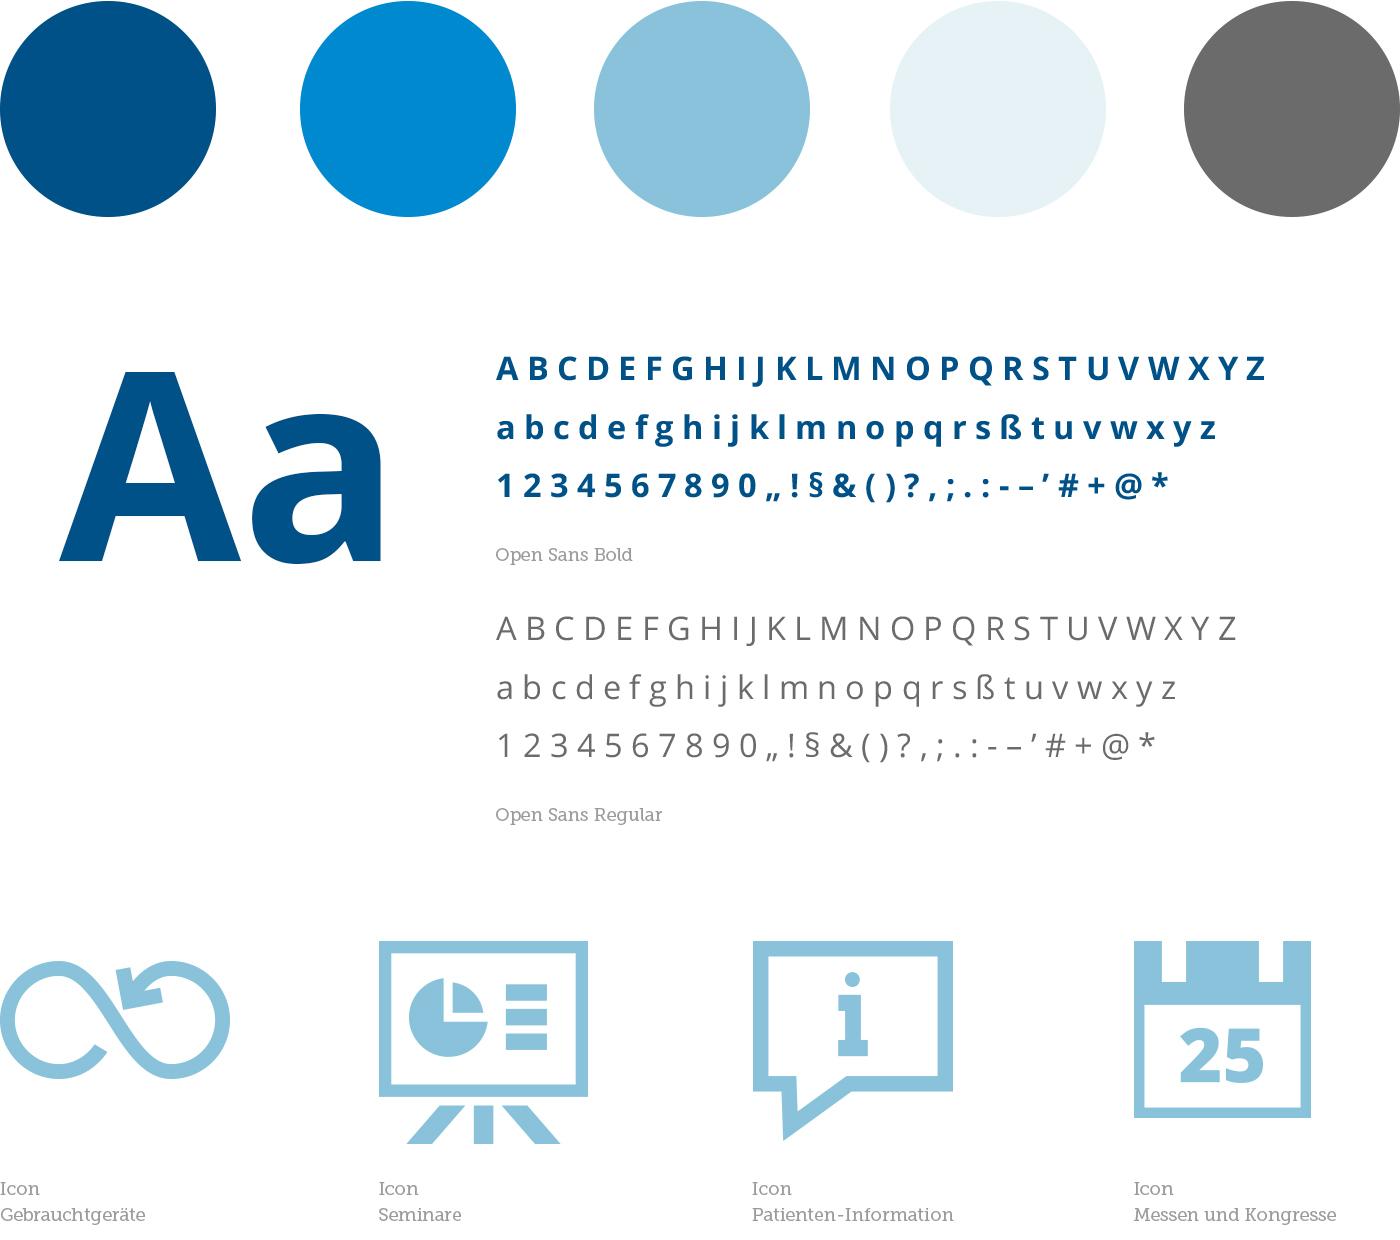 Storz Medical · Corporate Design · Corporate · Identity · CI · CD· Farben · Geschäftsausstattung · Briefbogen · Visitenkarten · Art Crash Werbeagentur Karlsruhe